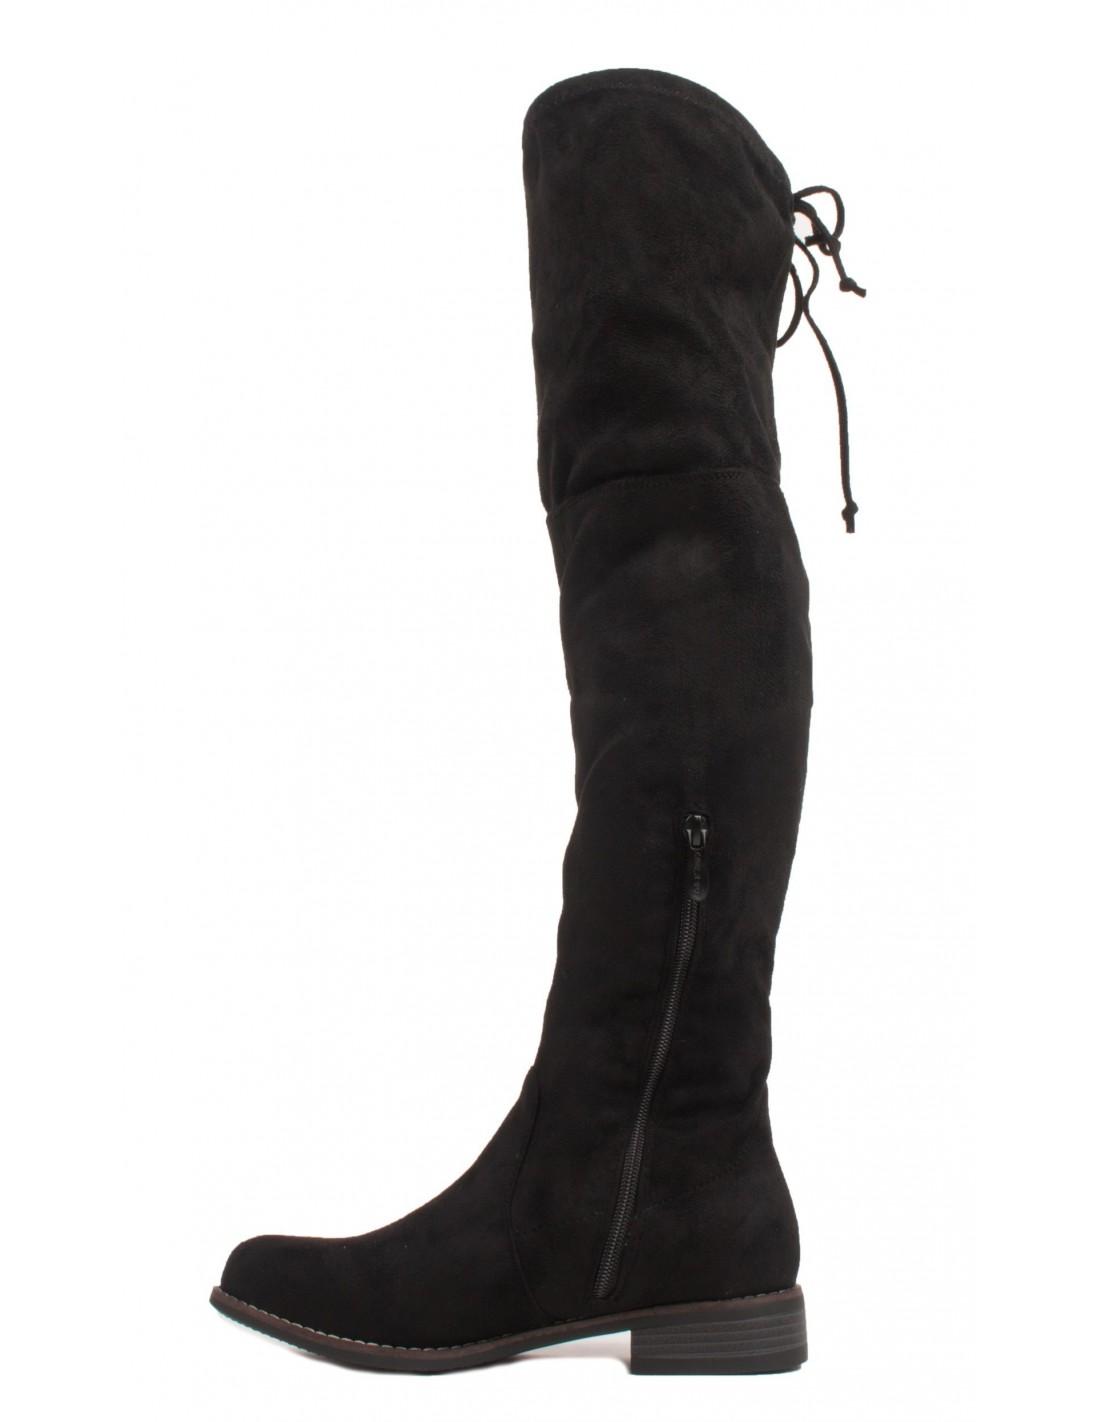 bottes cuissarde en daim noir femme